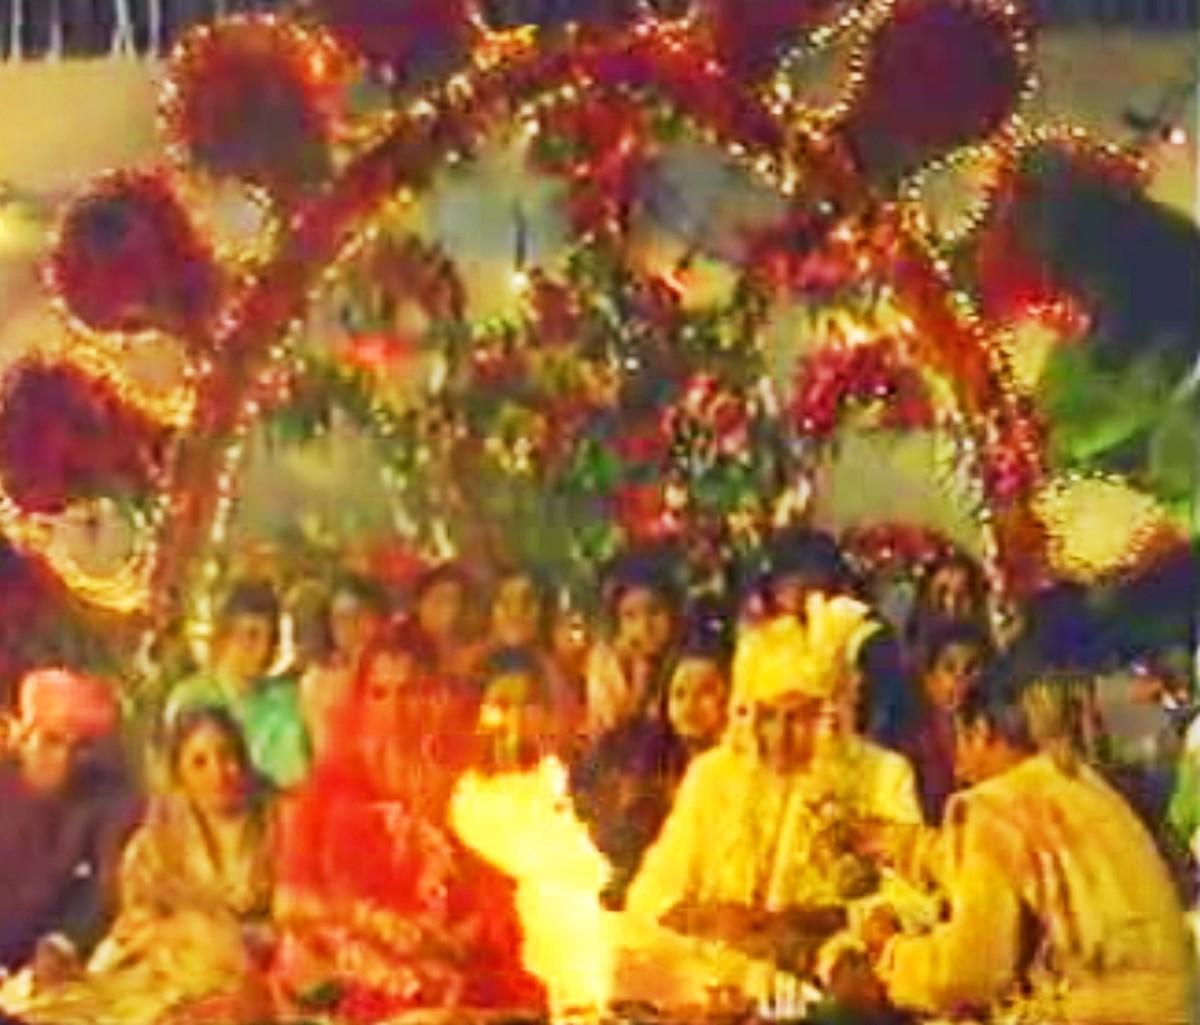 A great Rafi number reflecting the close relationship of Karun Ras with Raag Darbari Kanada